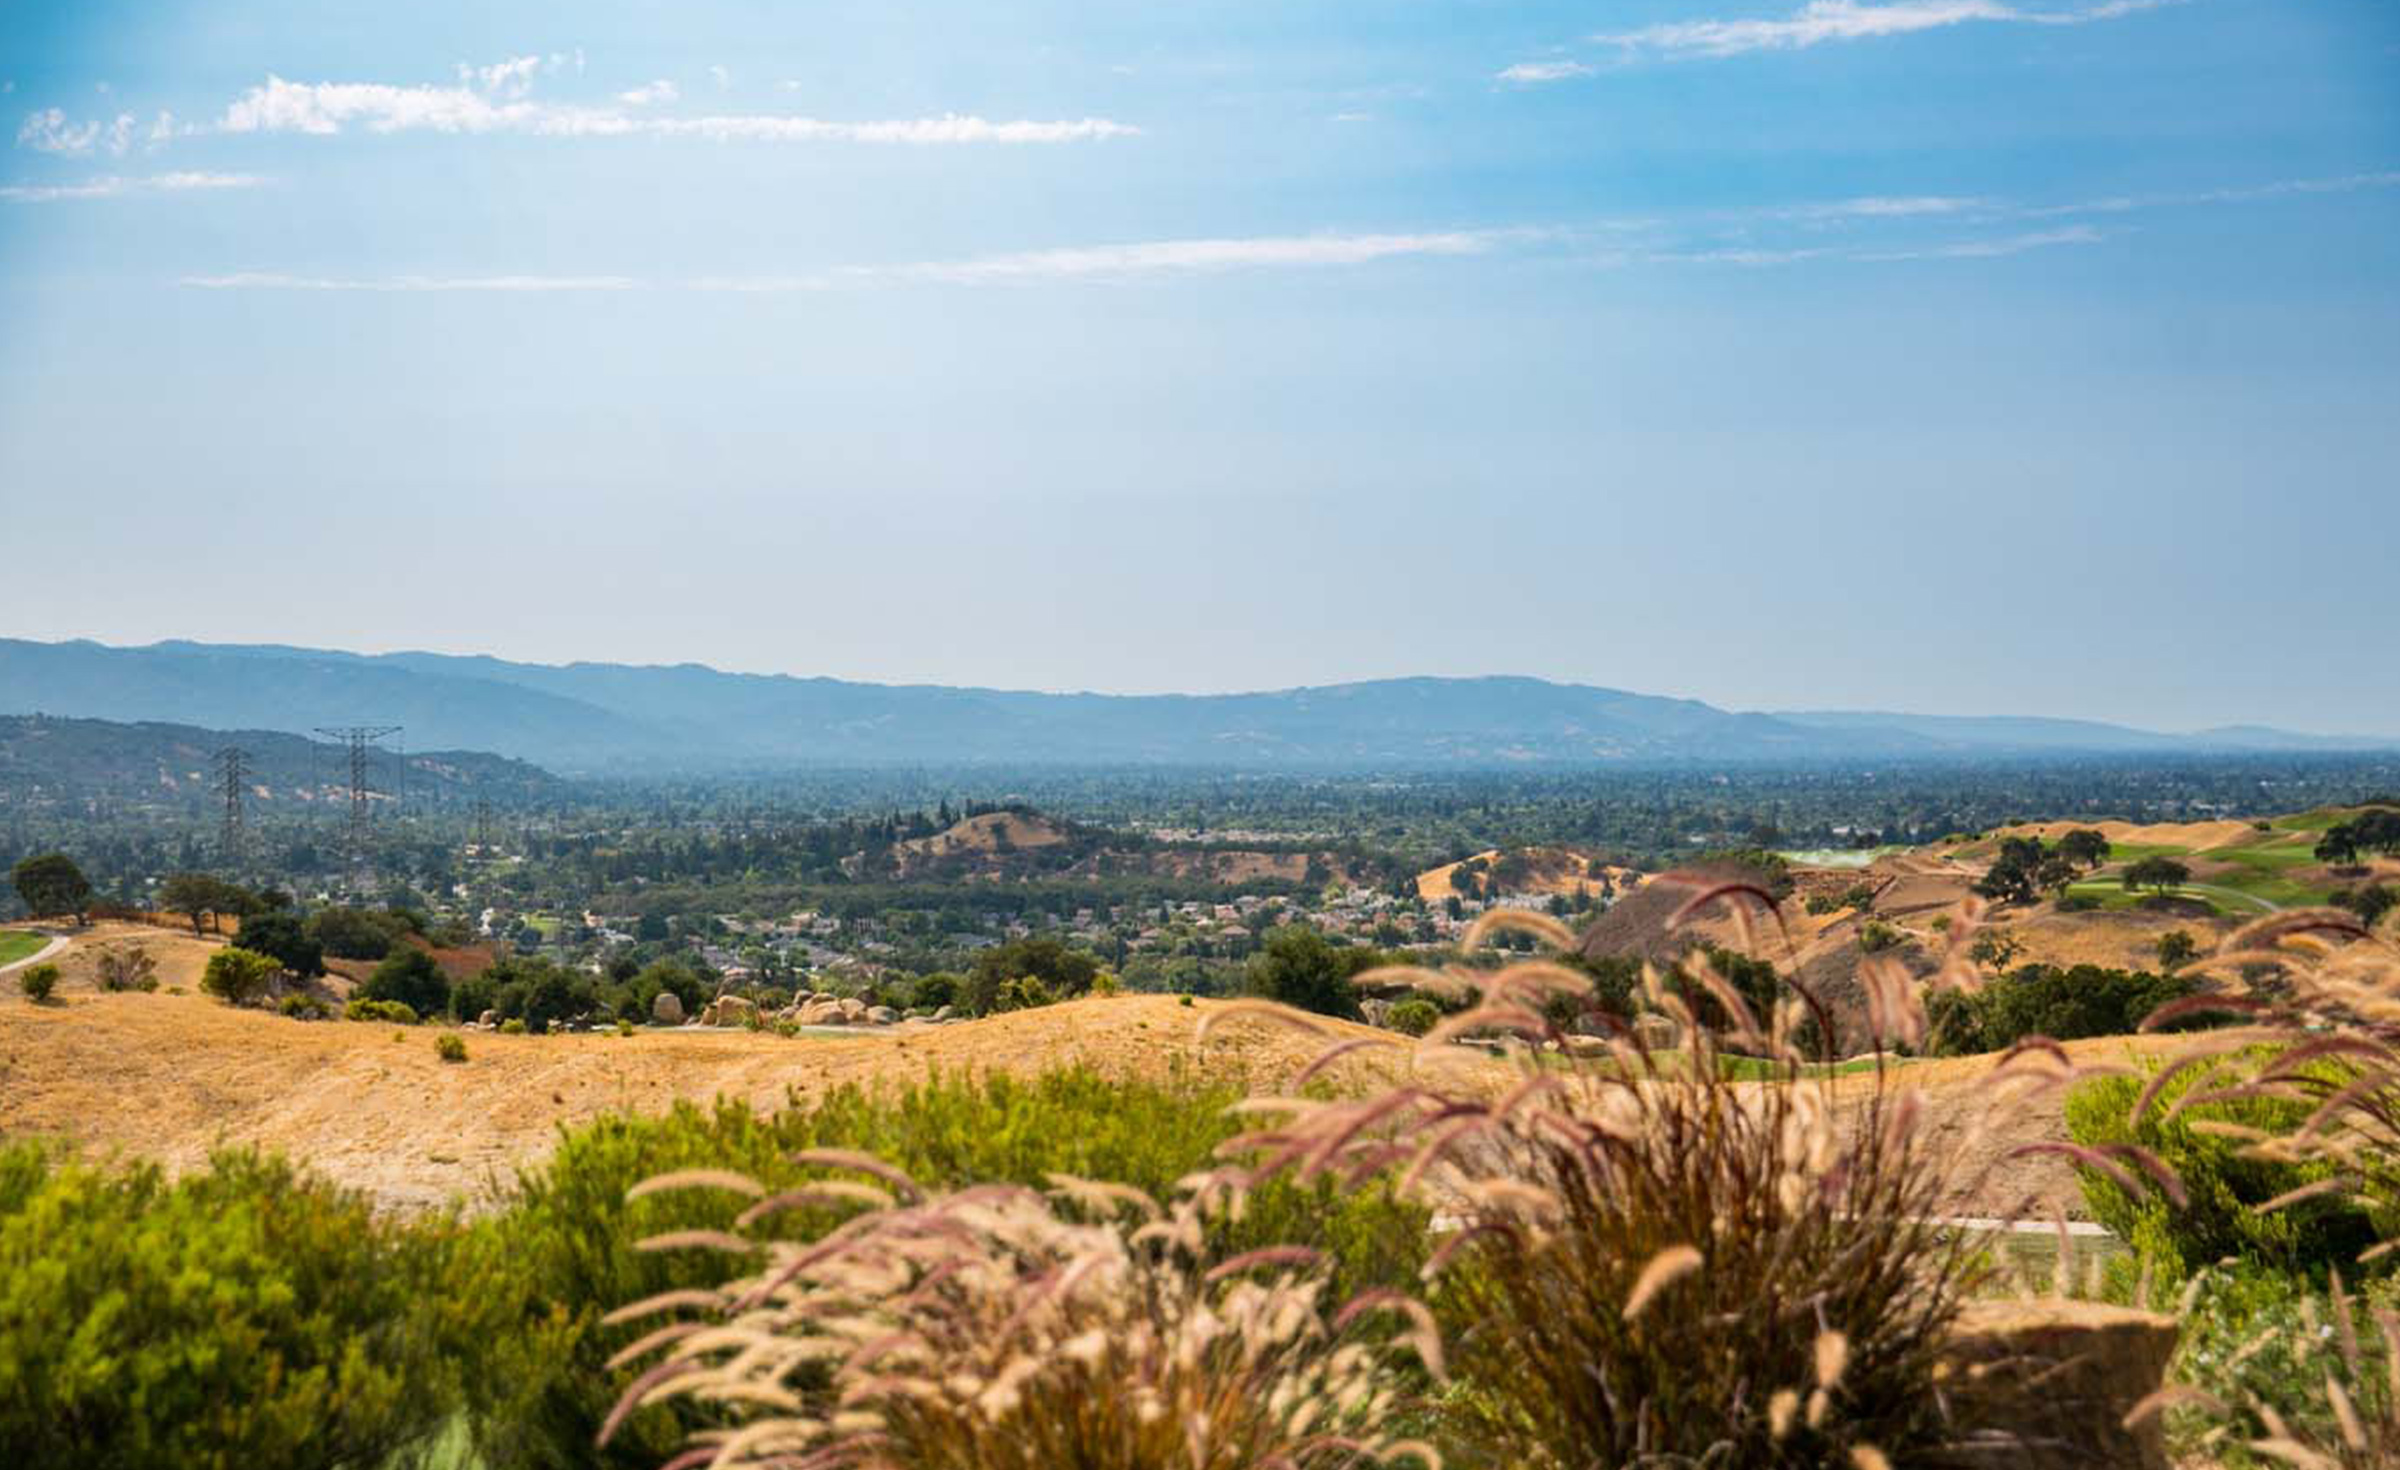 Endless Views - Boulder Ridge - Los Gatos, California - San Jose, California - Santa Clara County - Wedgewood Weddings